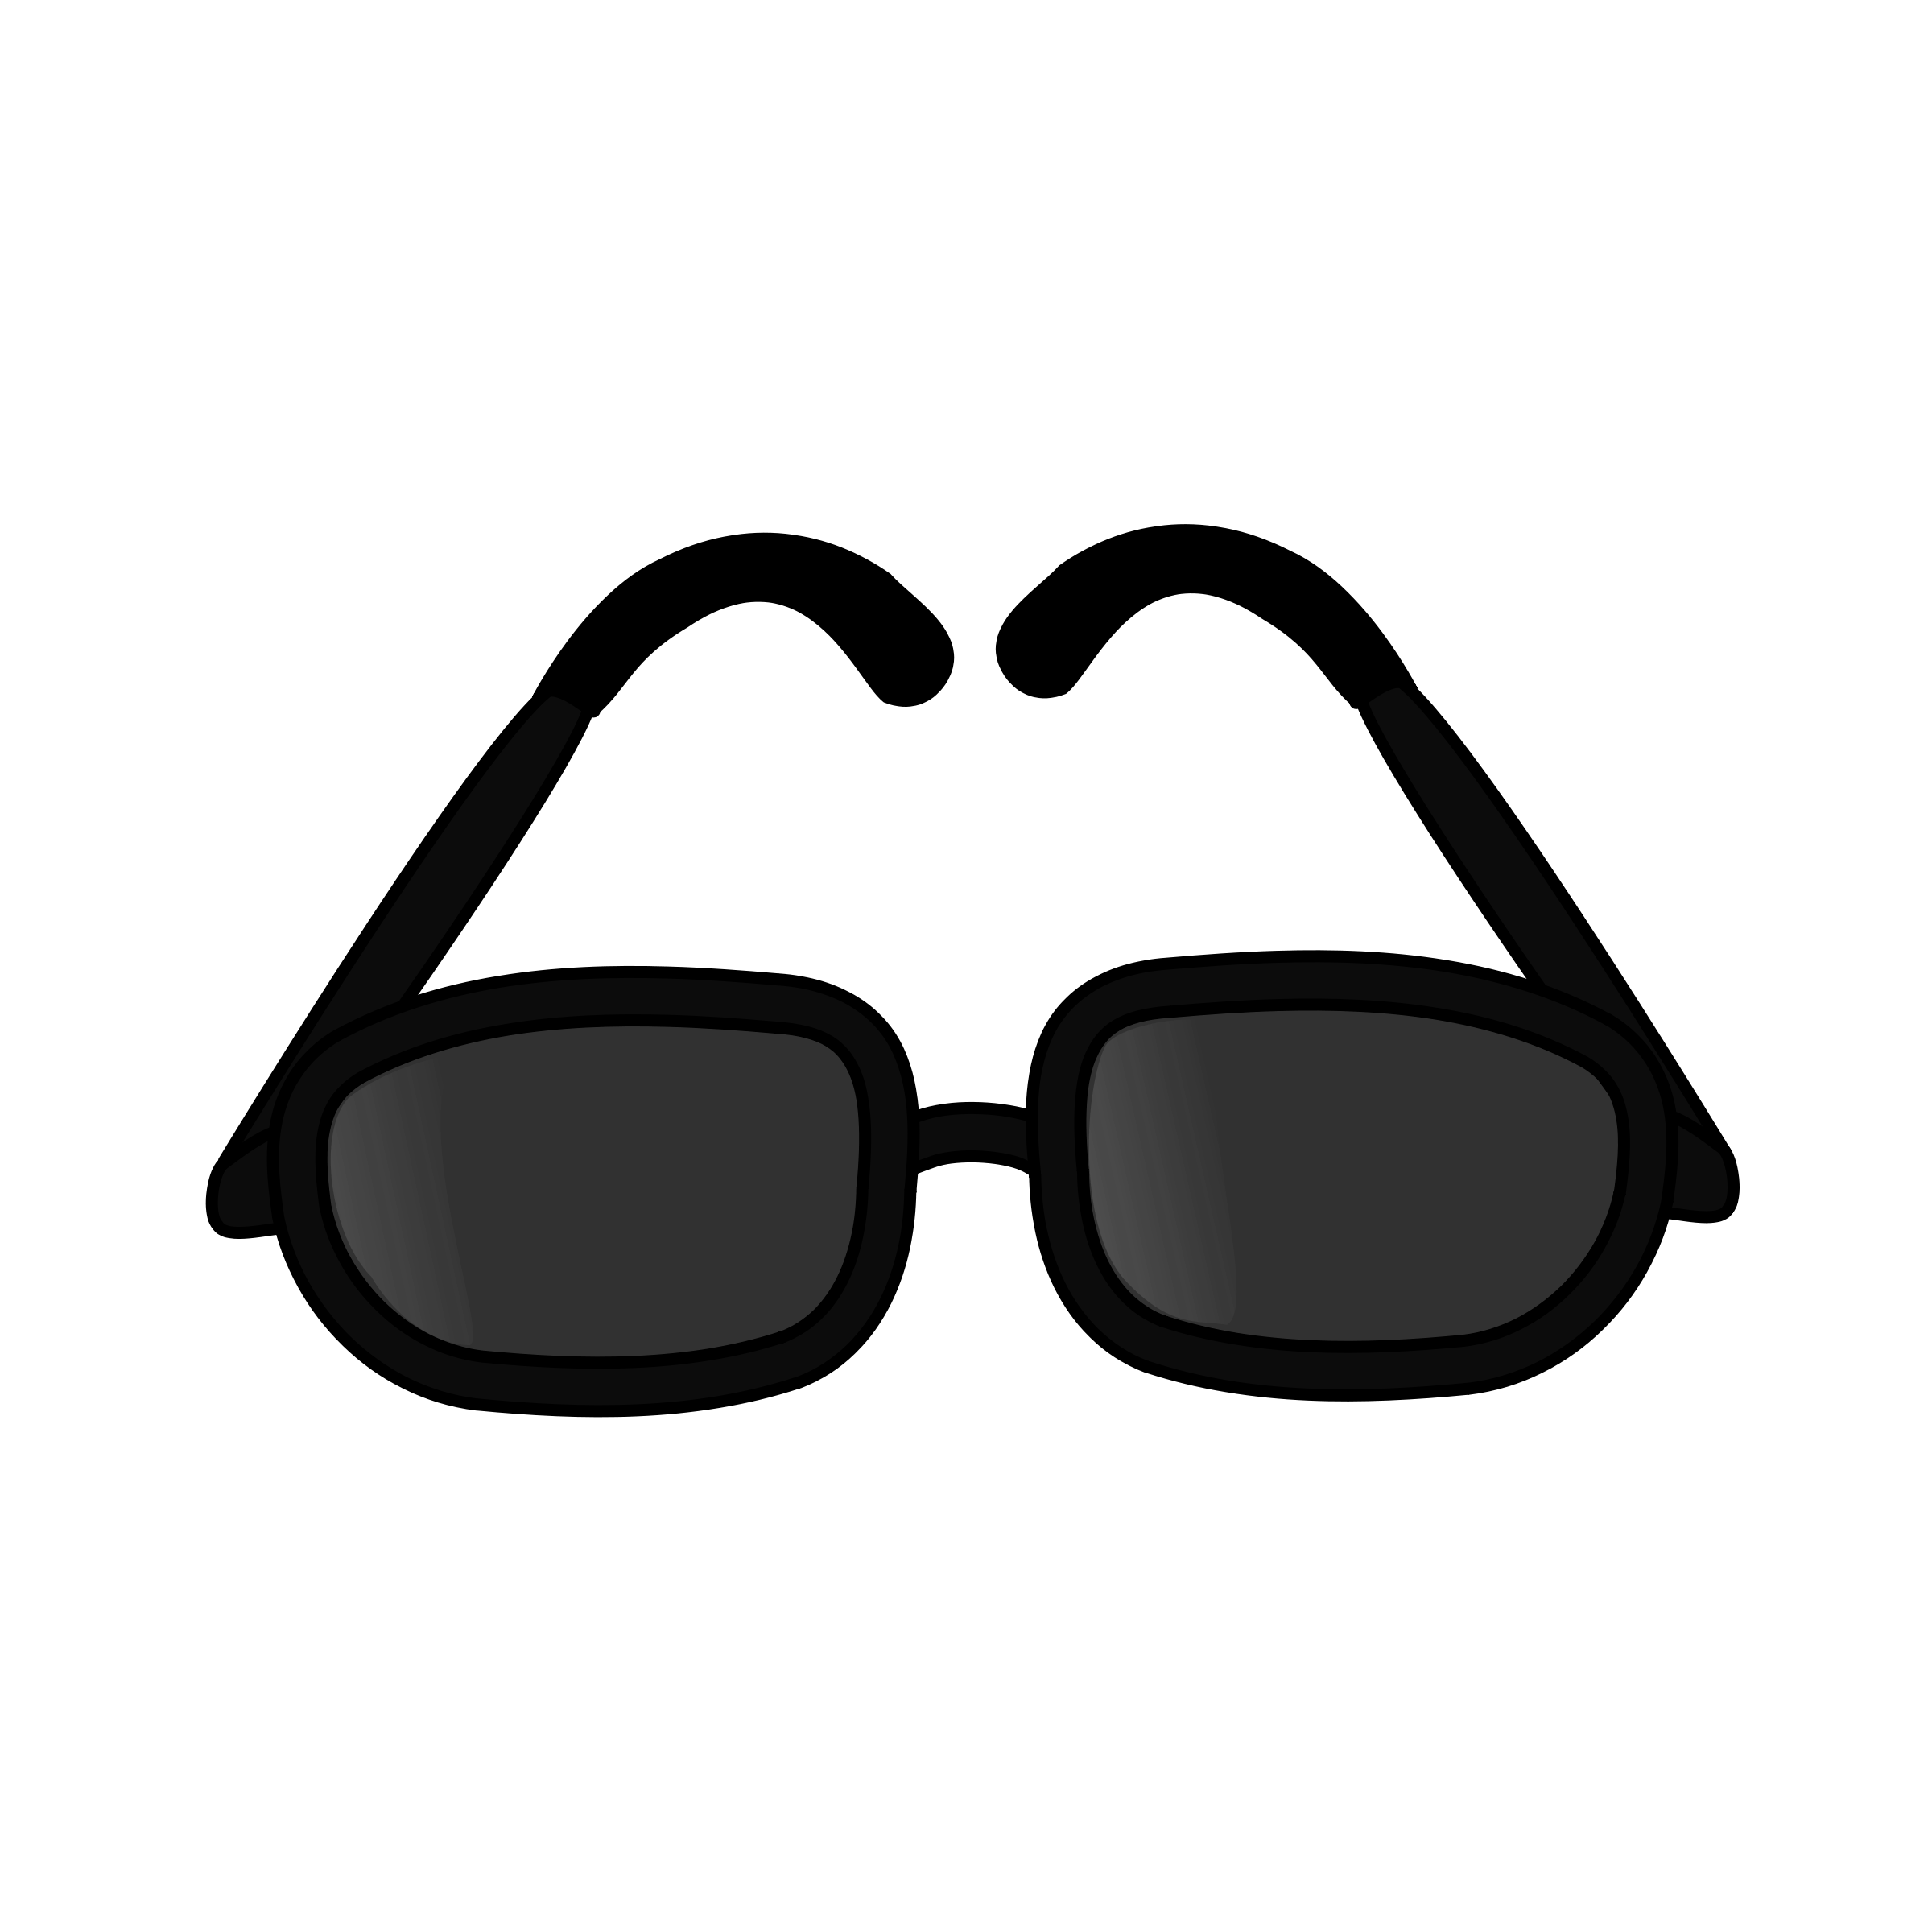 2400x2400 Sunglasses Clipart